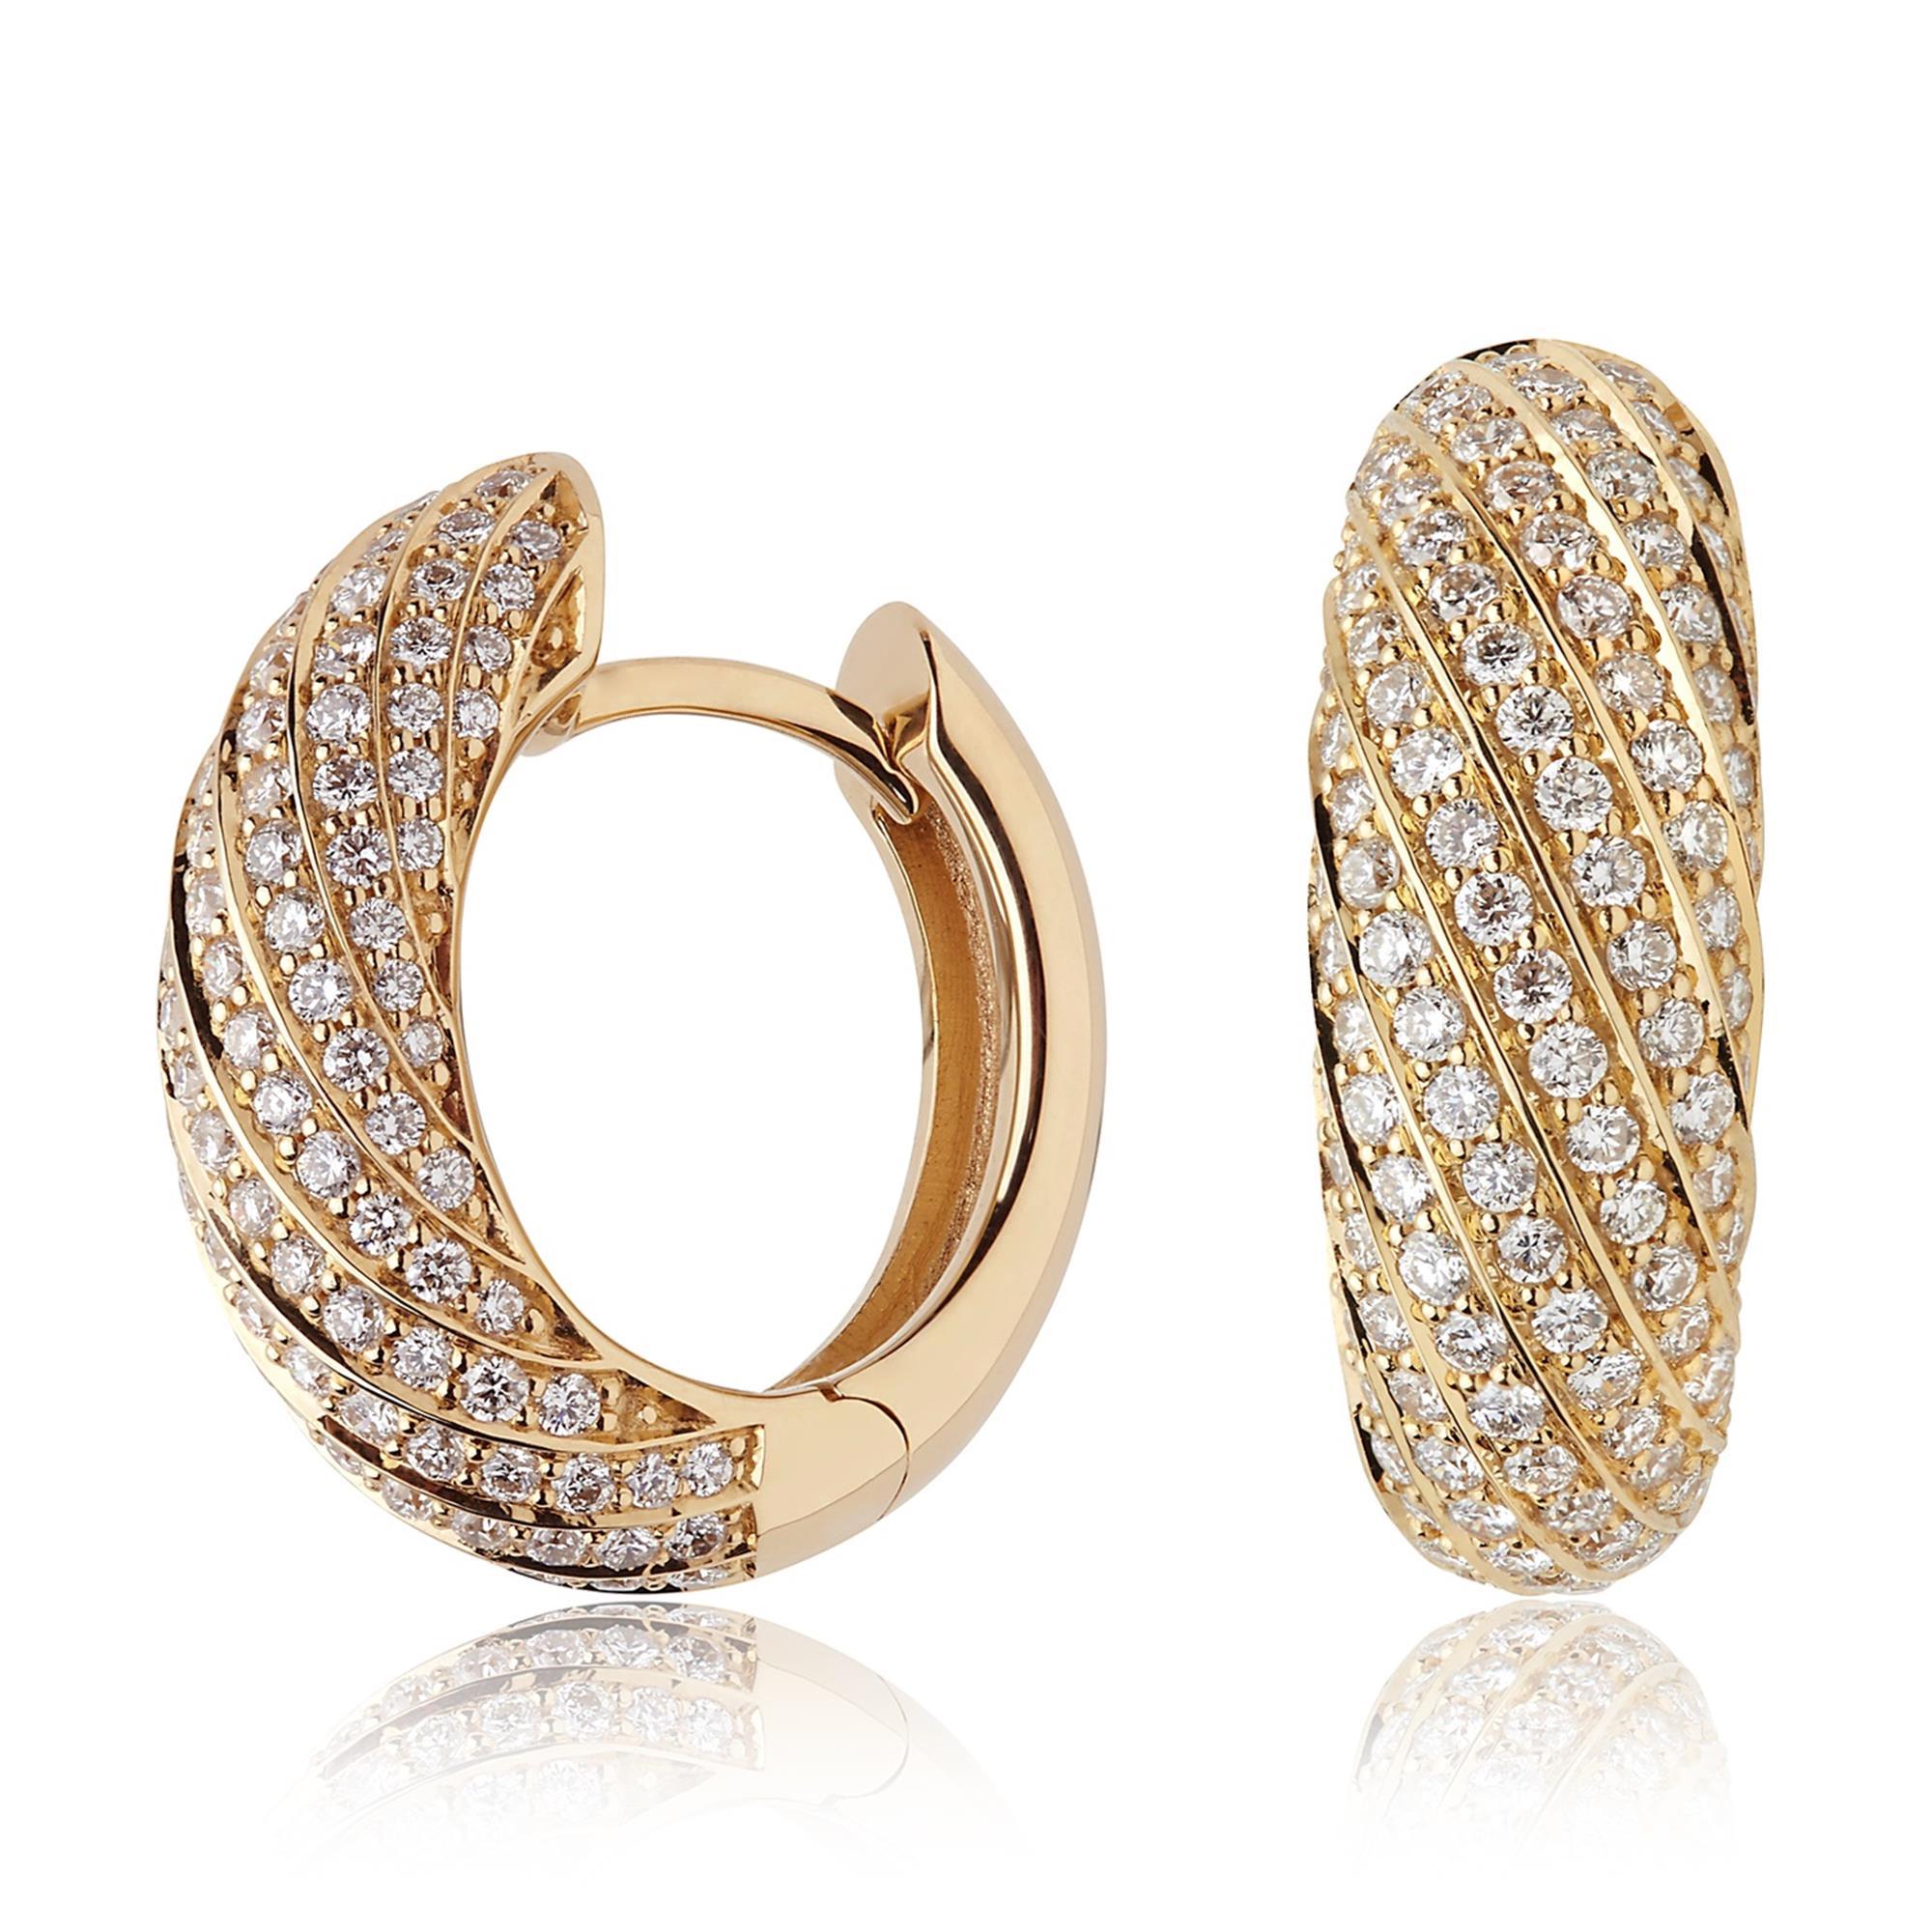 398b5b5765d Aira 18ct Yellow Gold Diamond Hoop Earrings | Pravins Jewellers